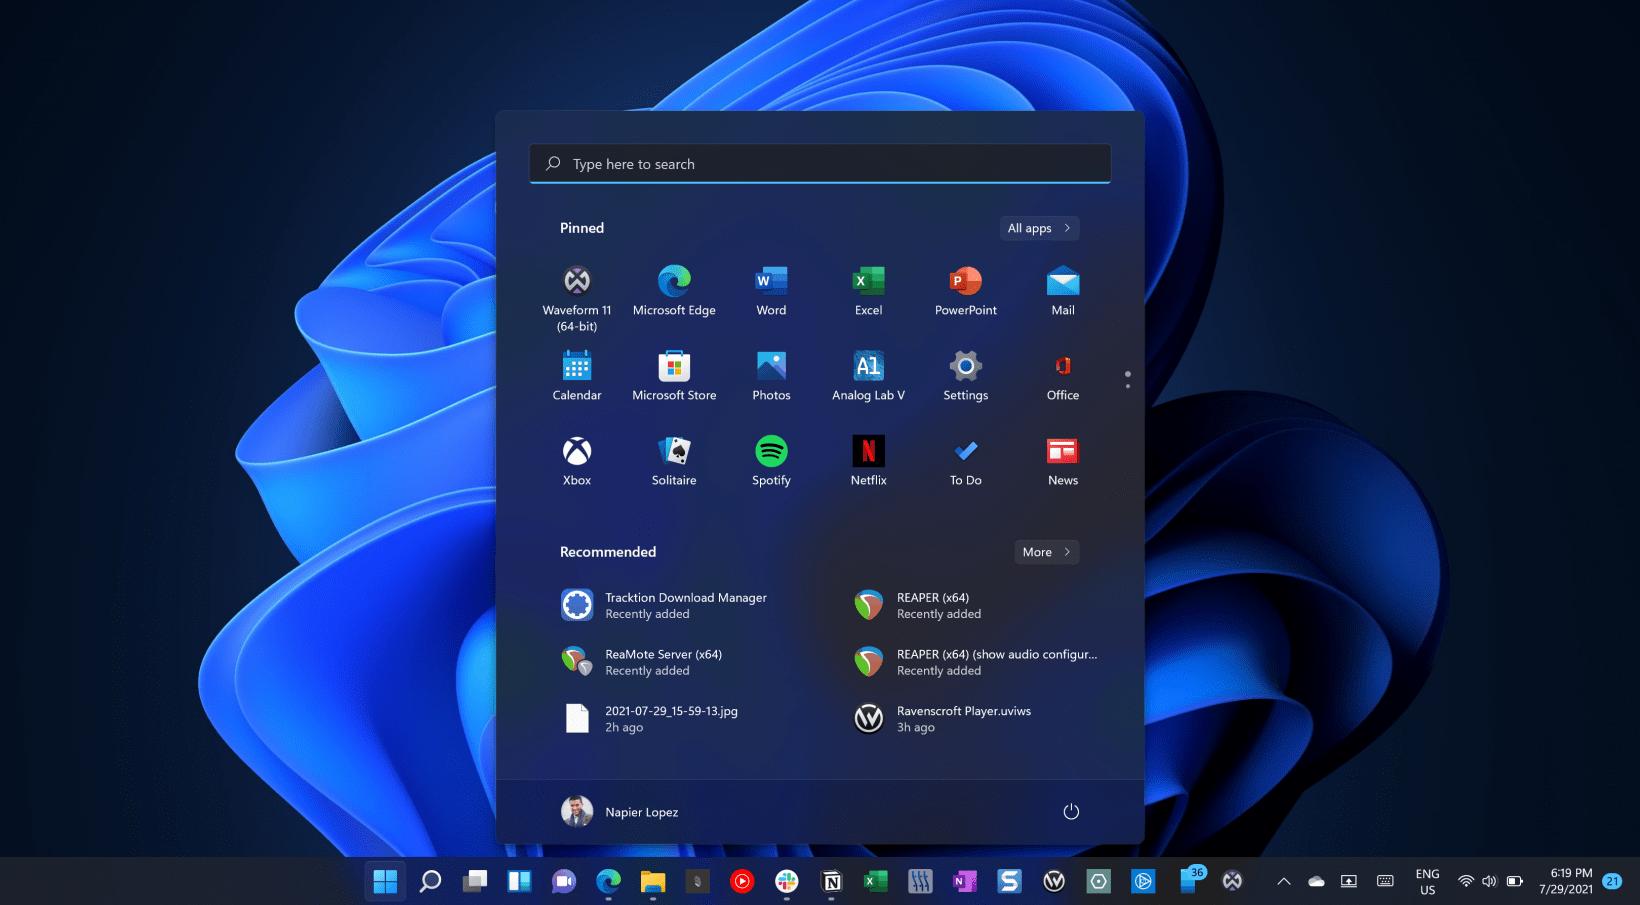 Windows 11 home page